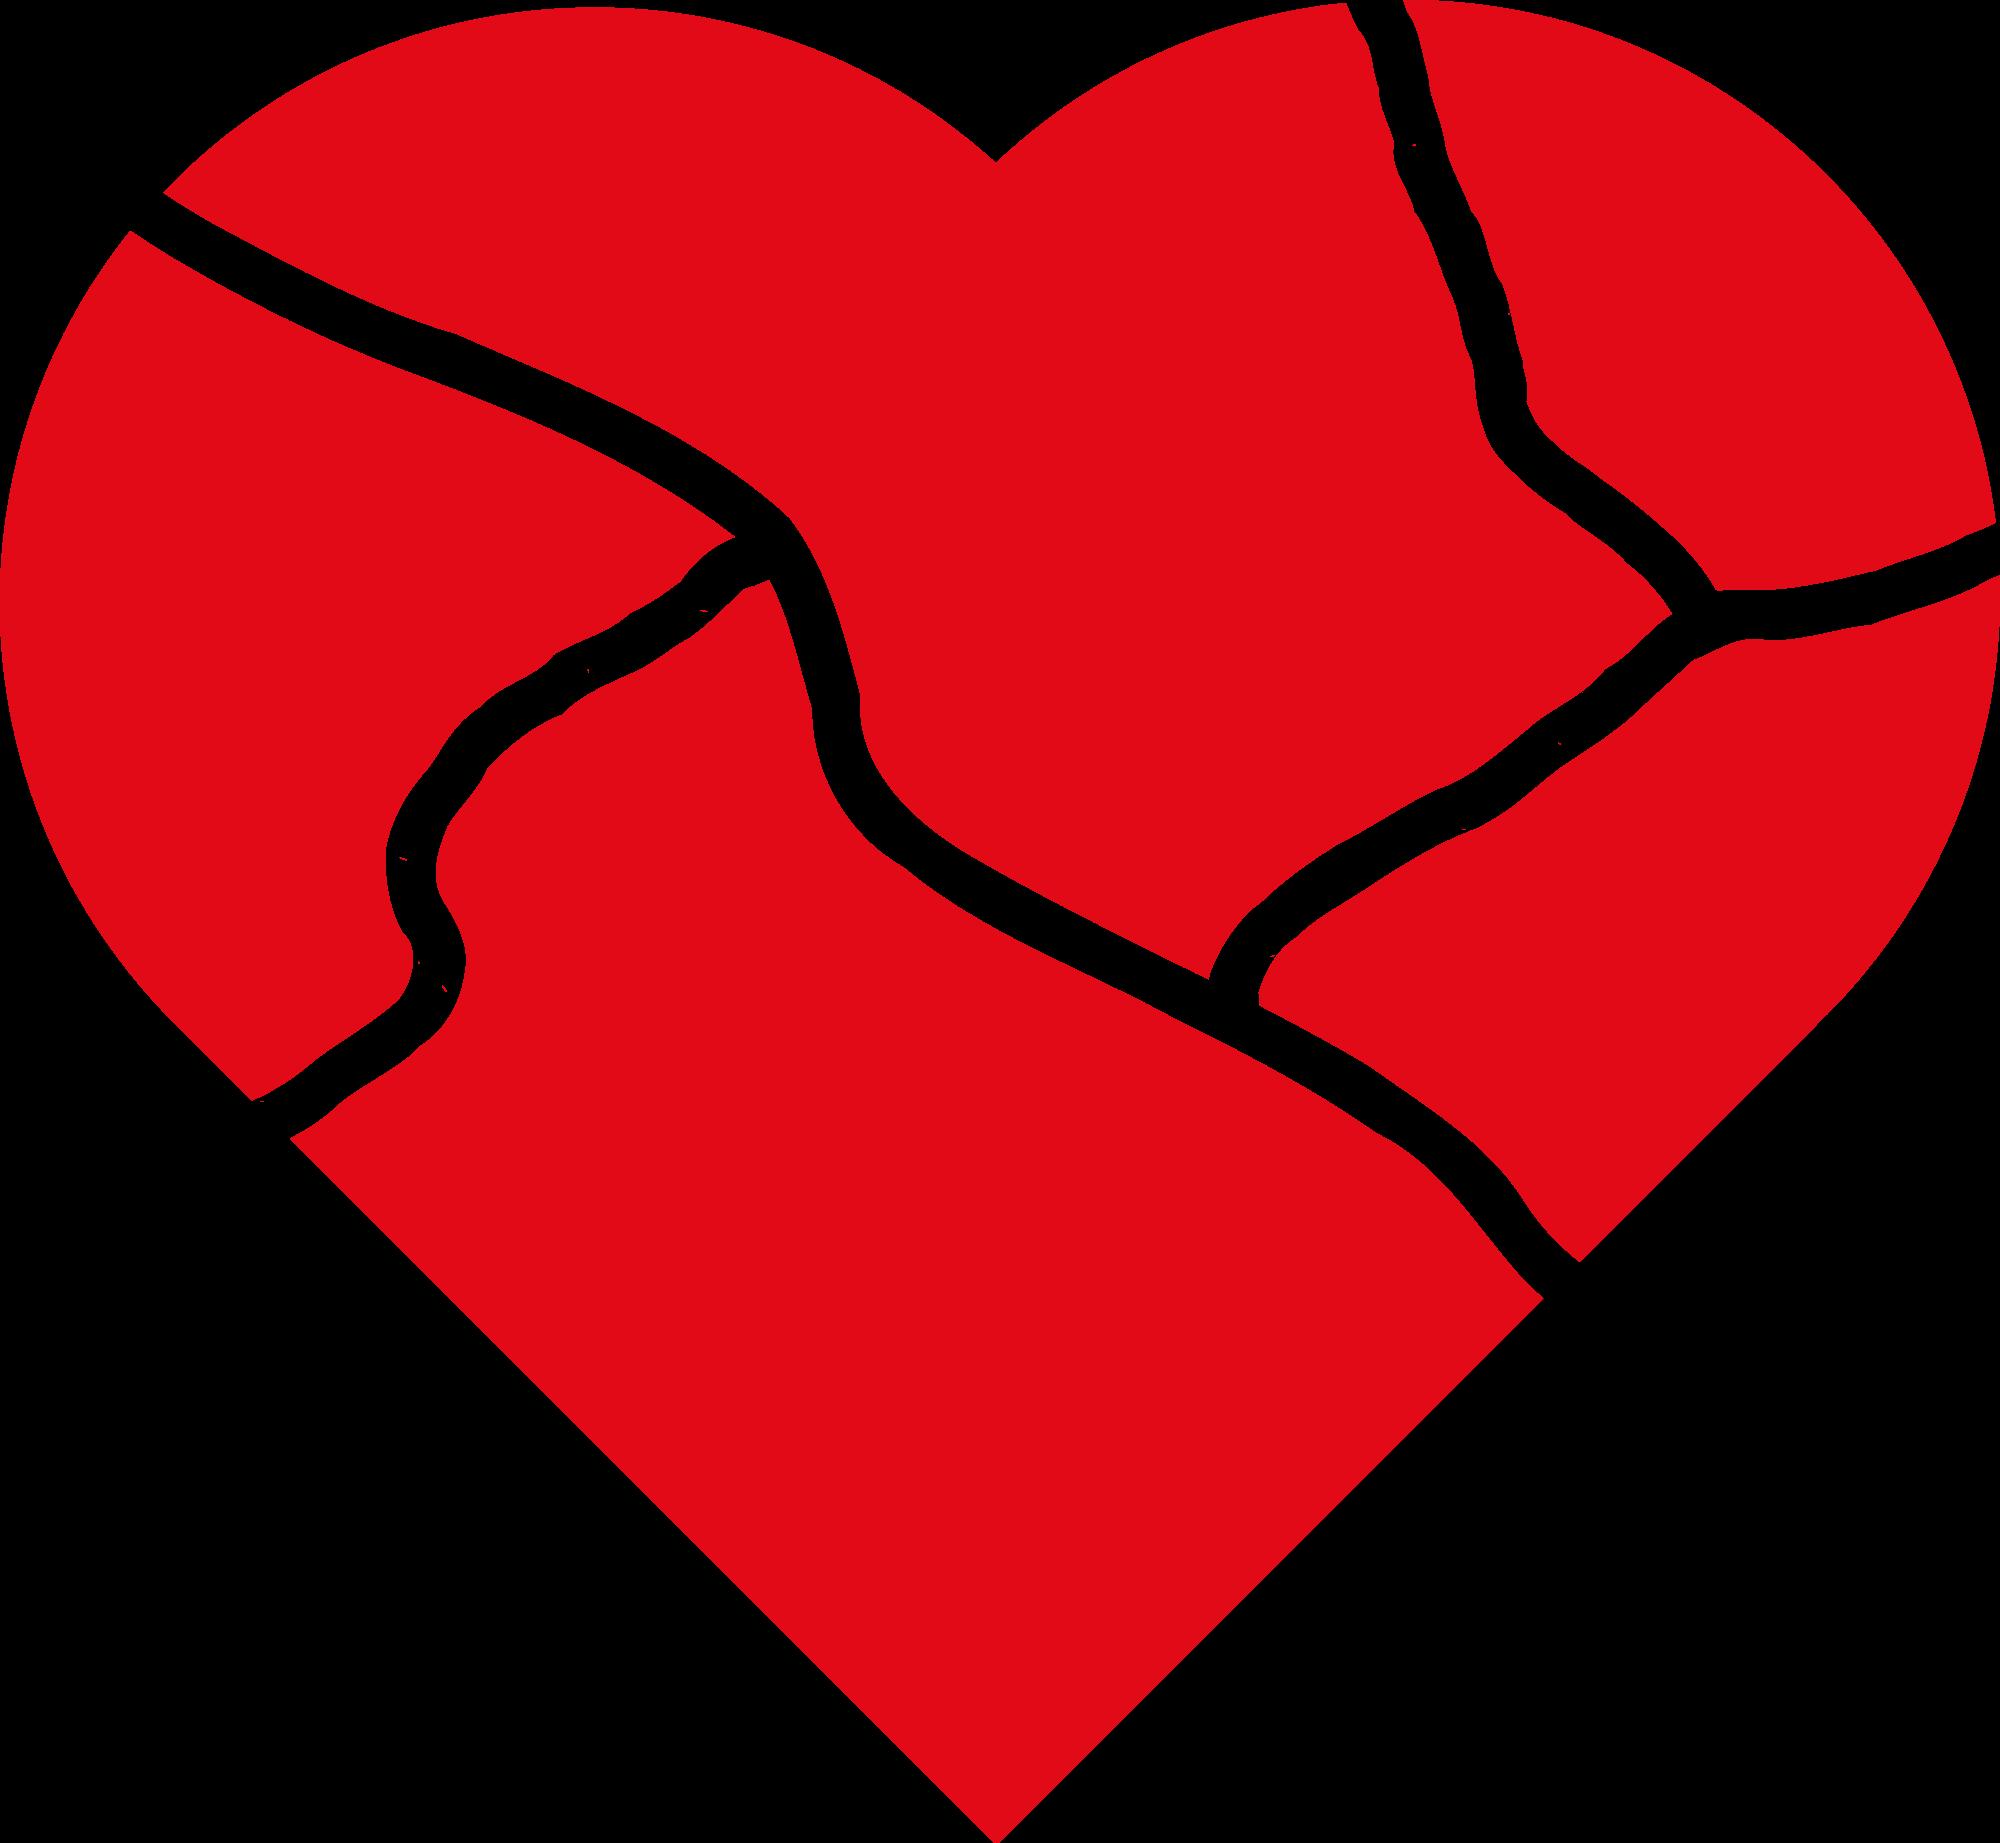 Broken Heart clipart small Svg symbol Commons Wikimedia File:Broken